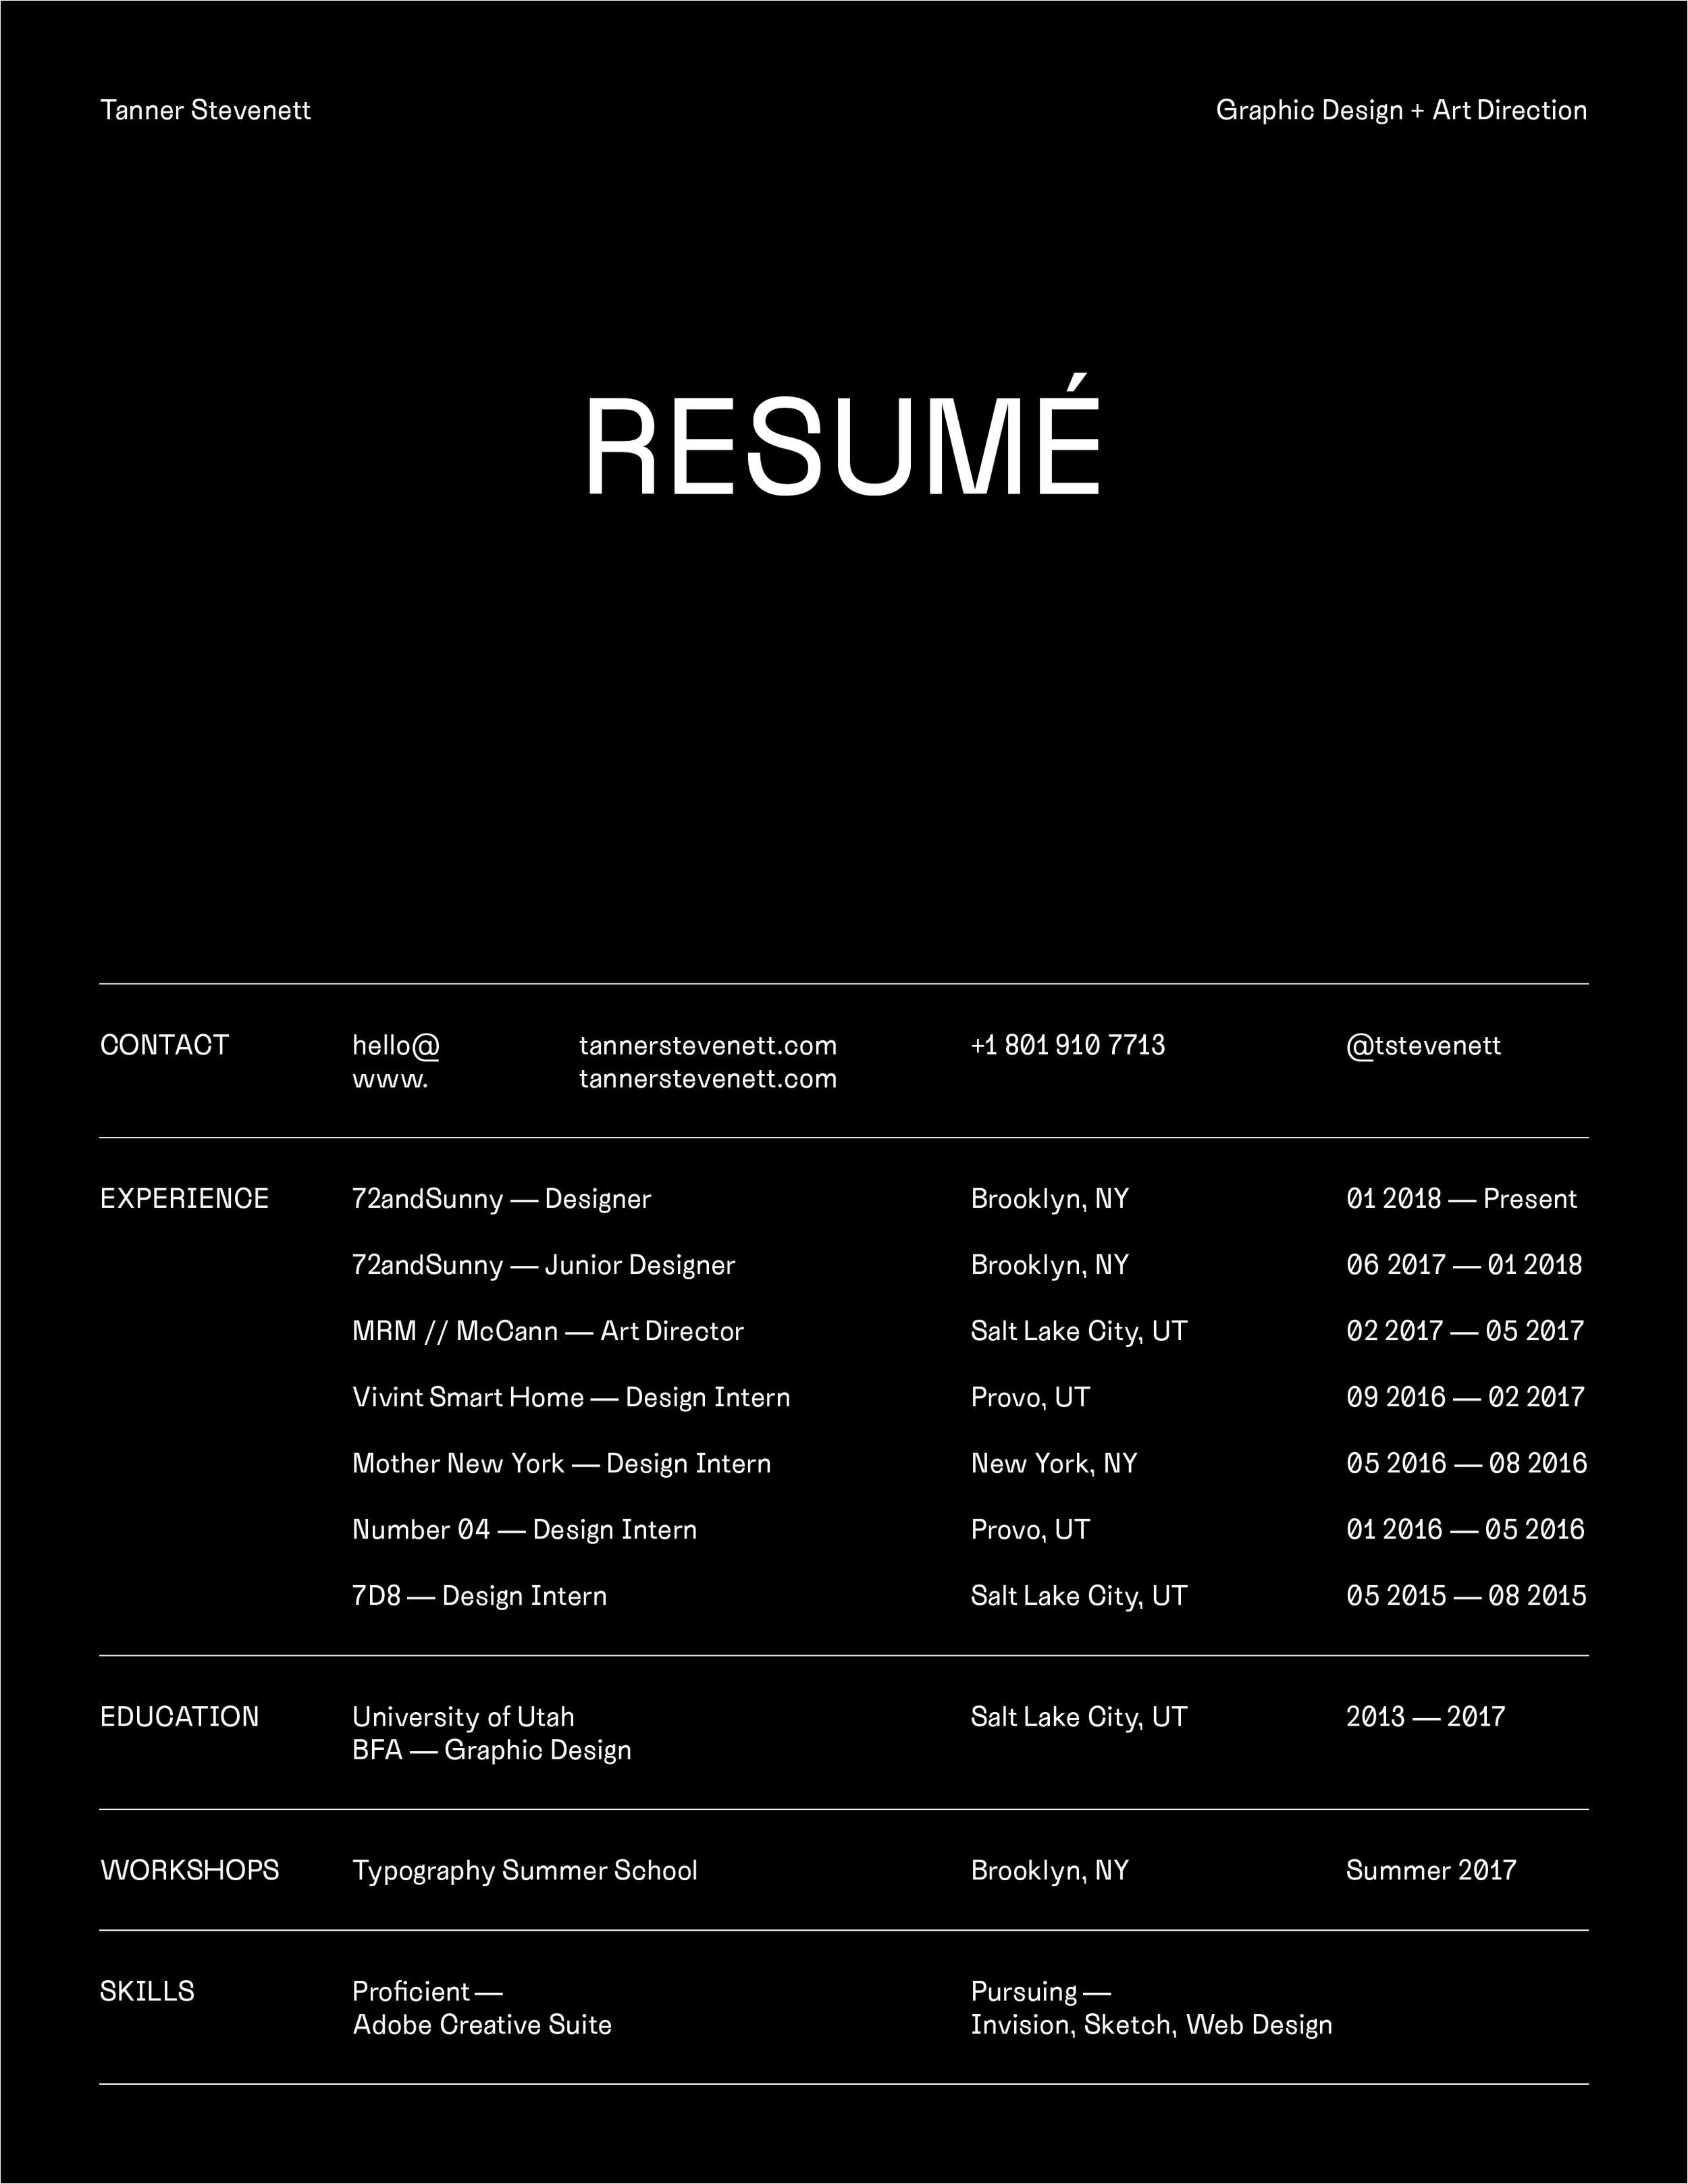 ts_resume_web_new.jpg